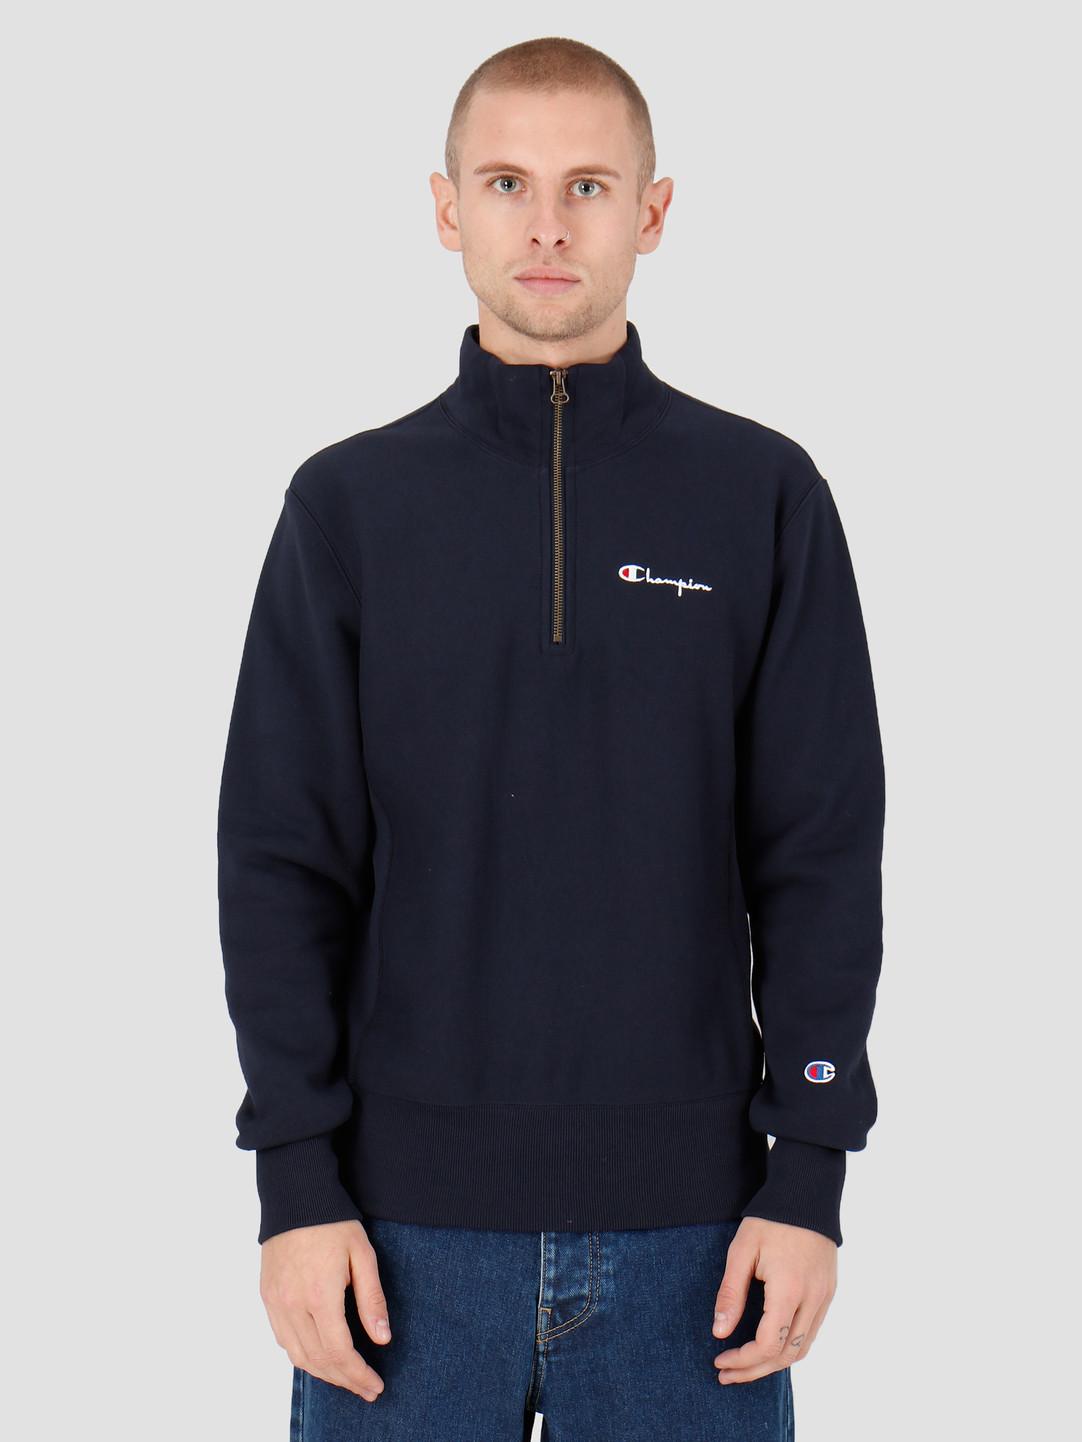 Champion Champion Half Zip Sweatshirt NNY 214051